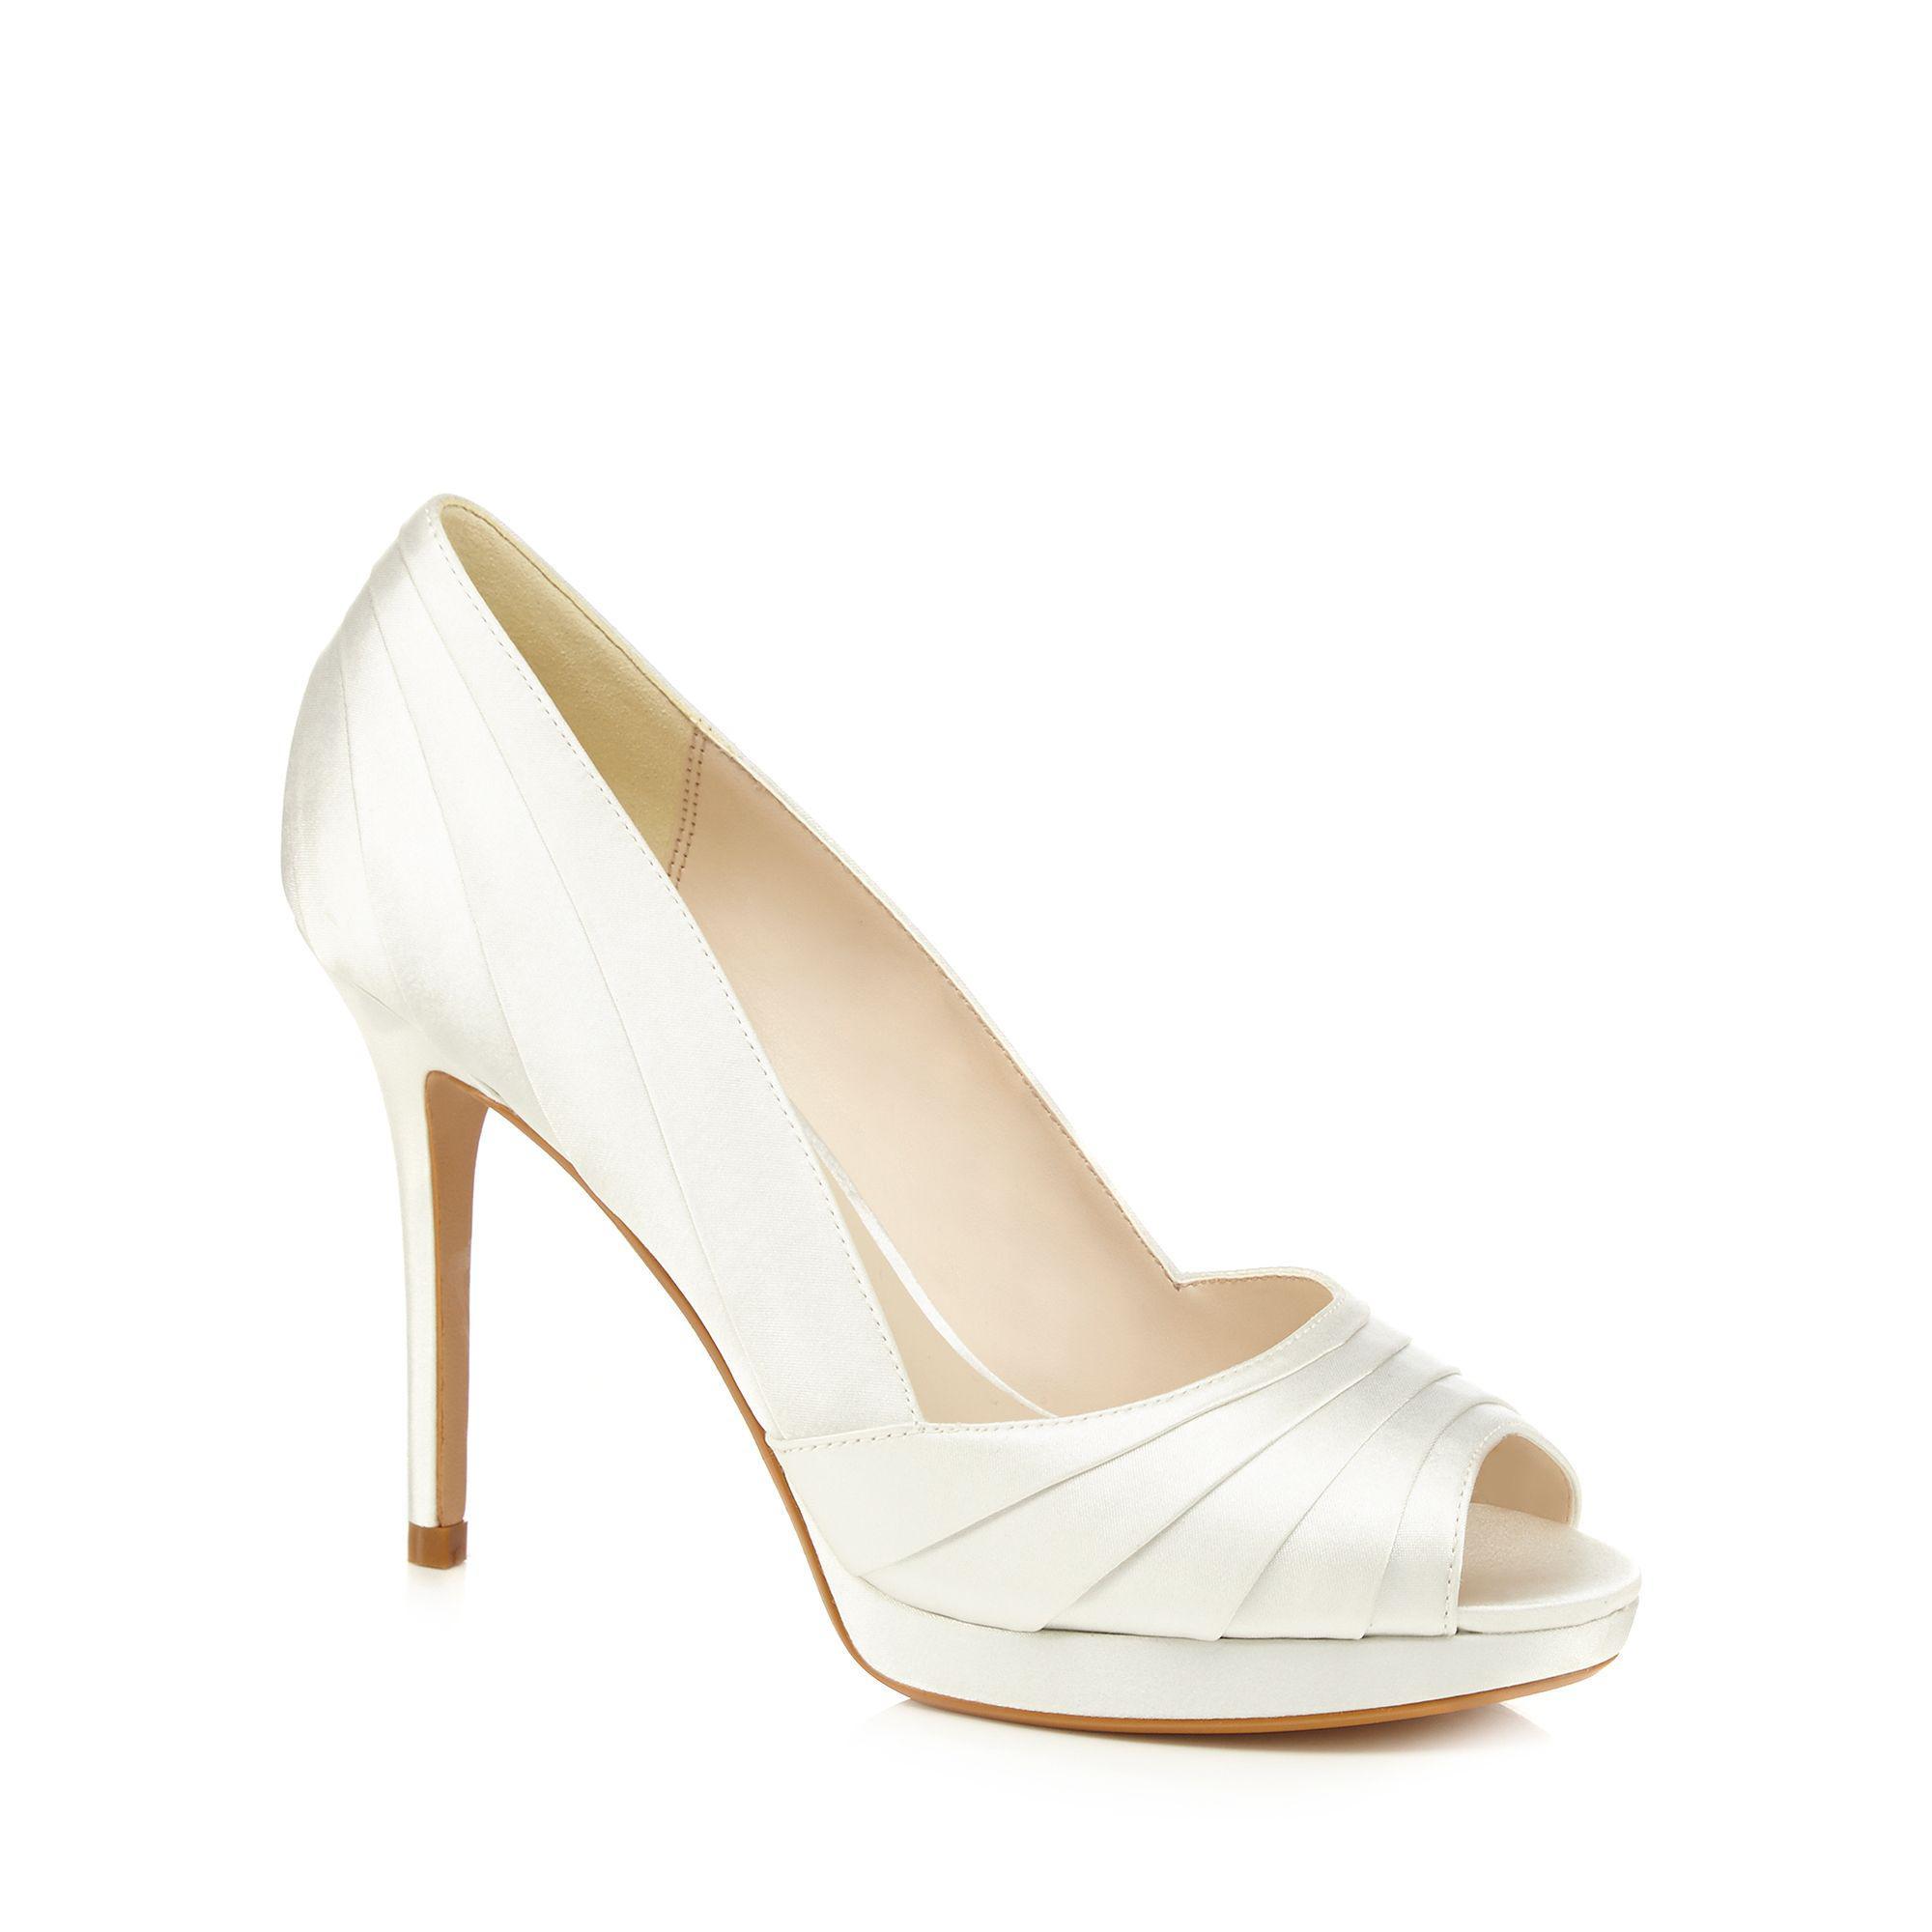 cf7cc45c73b Jenny Packham Ivory Satin  pandora  High Stiletto Heel Peep Toe ...